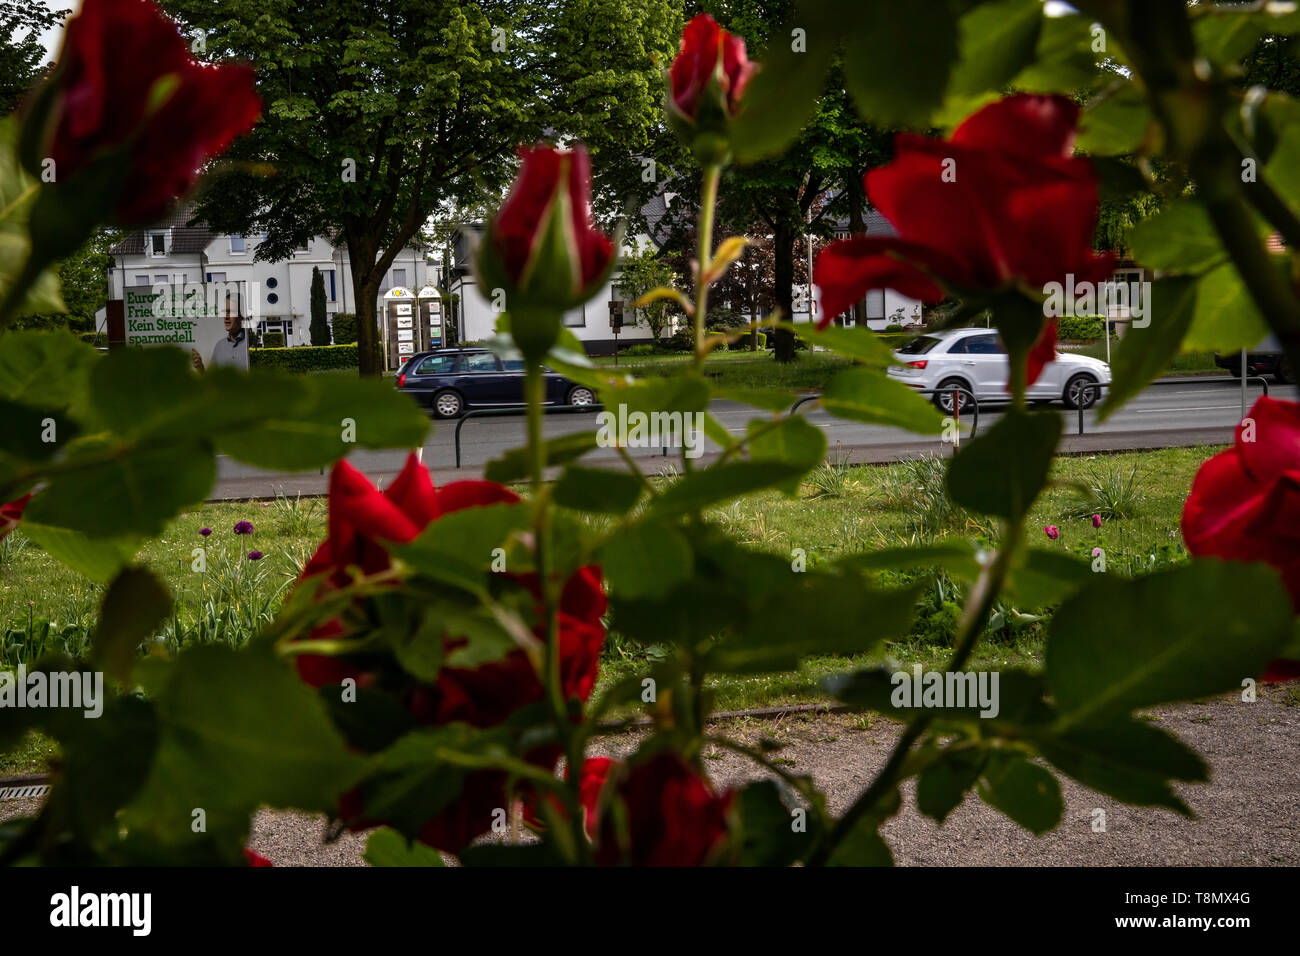 Views through roses onto the Bundesstrasse 1 in Dortmund - Stock Image